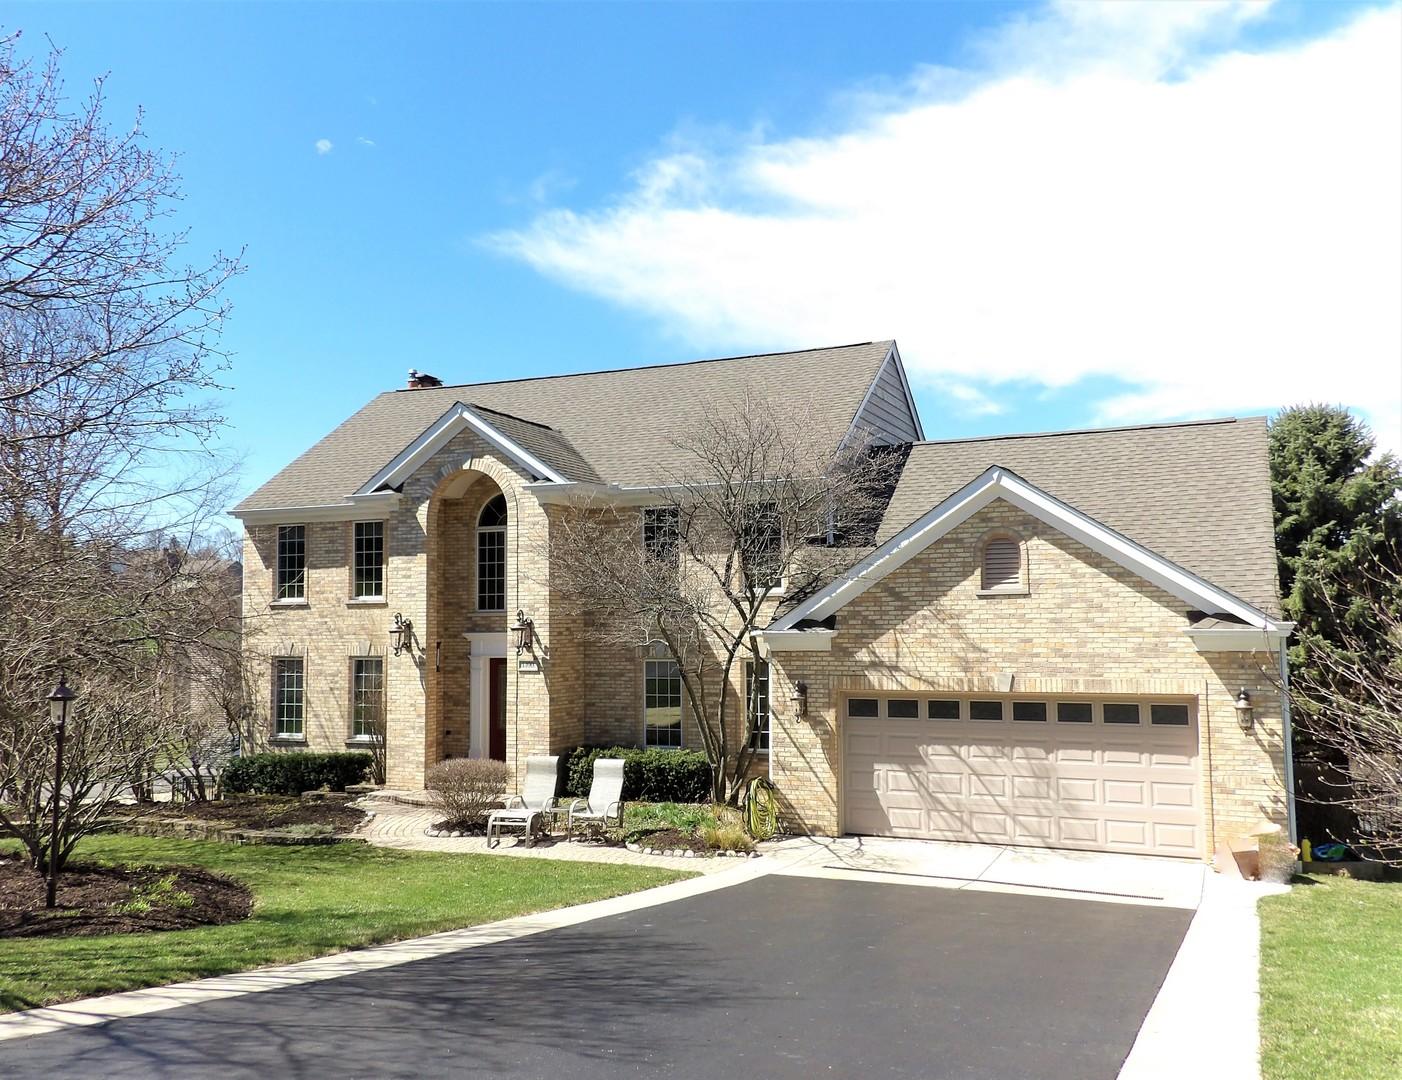 1390 Braewood Drive, Algonquin, IL 60102